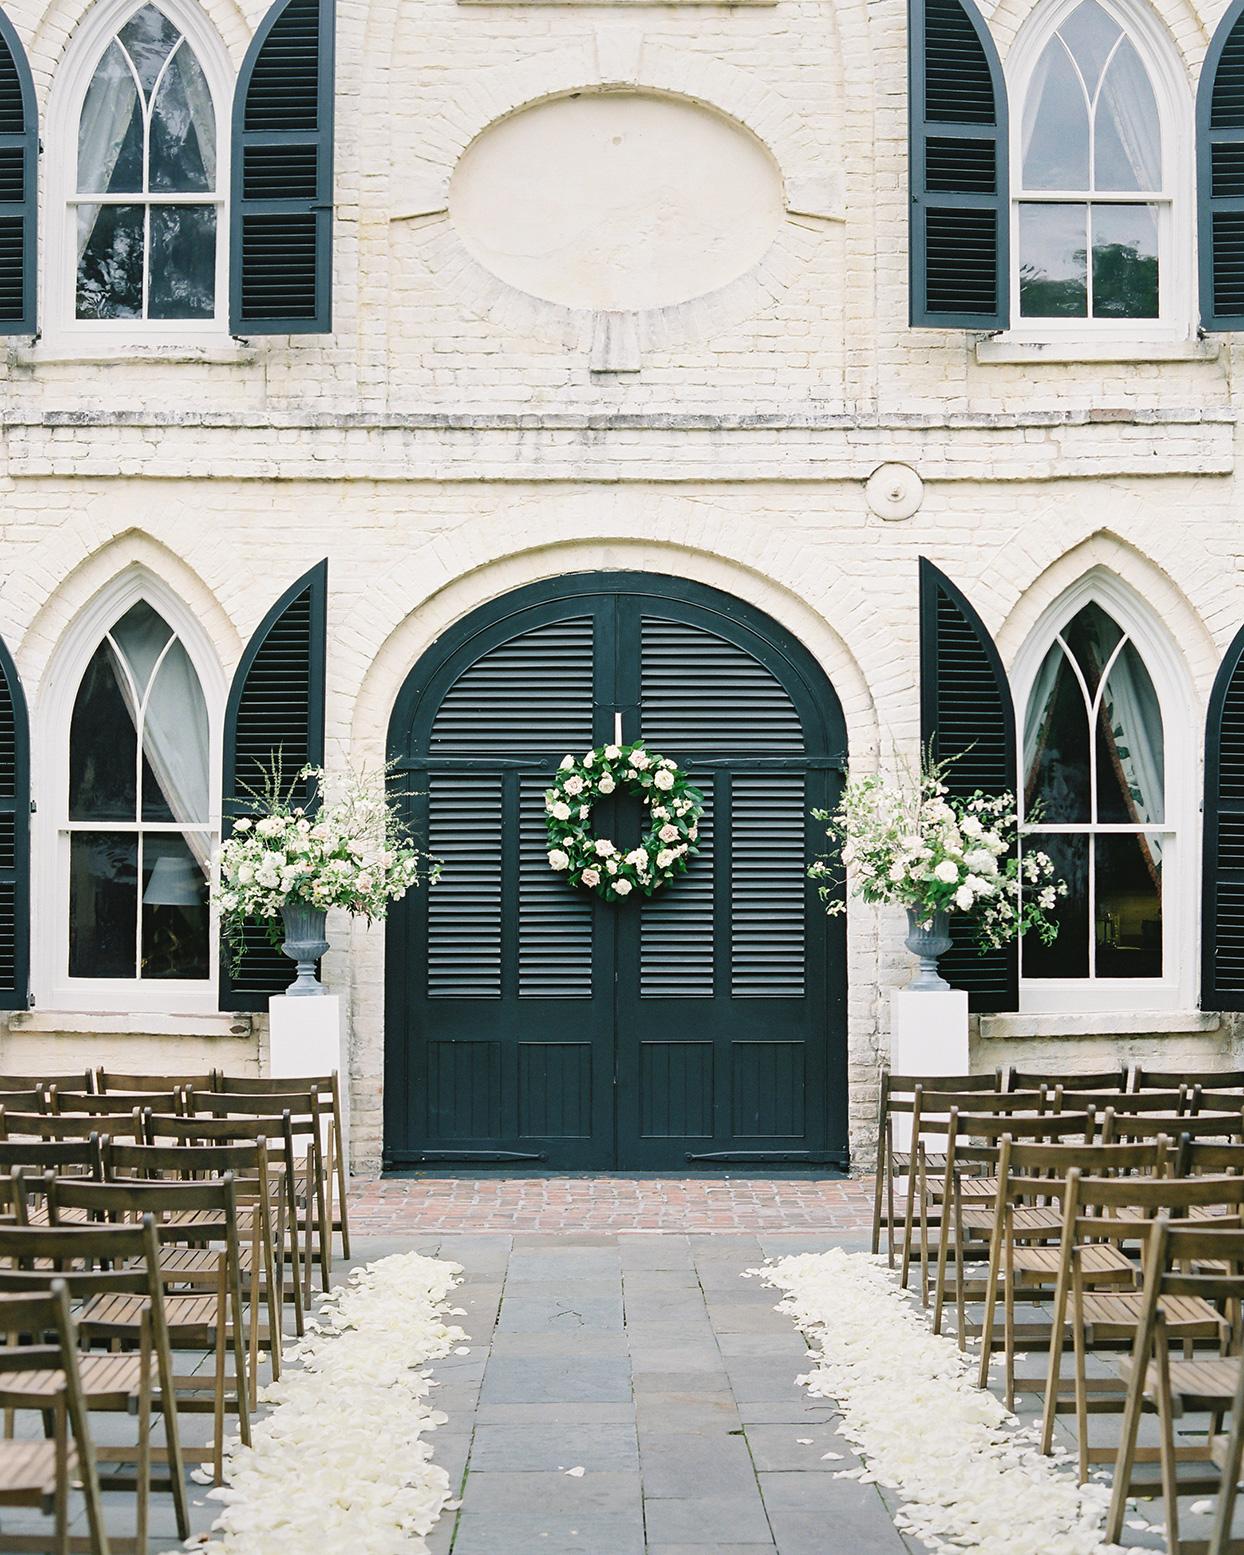 paula terence wedding ceremony location black doors with wreath